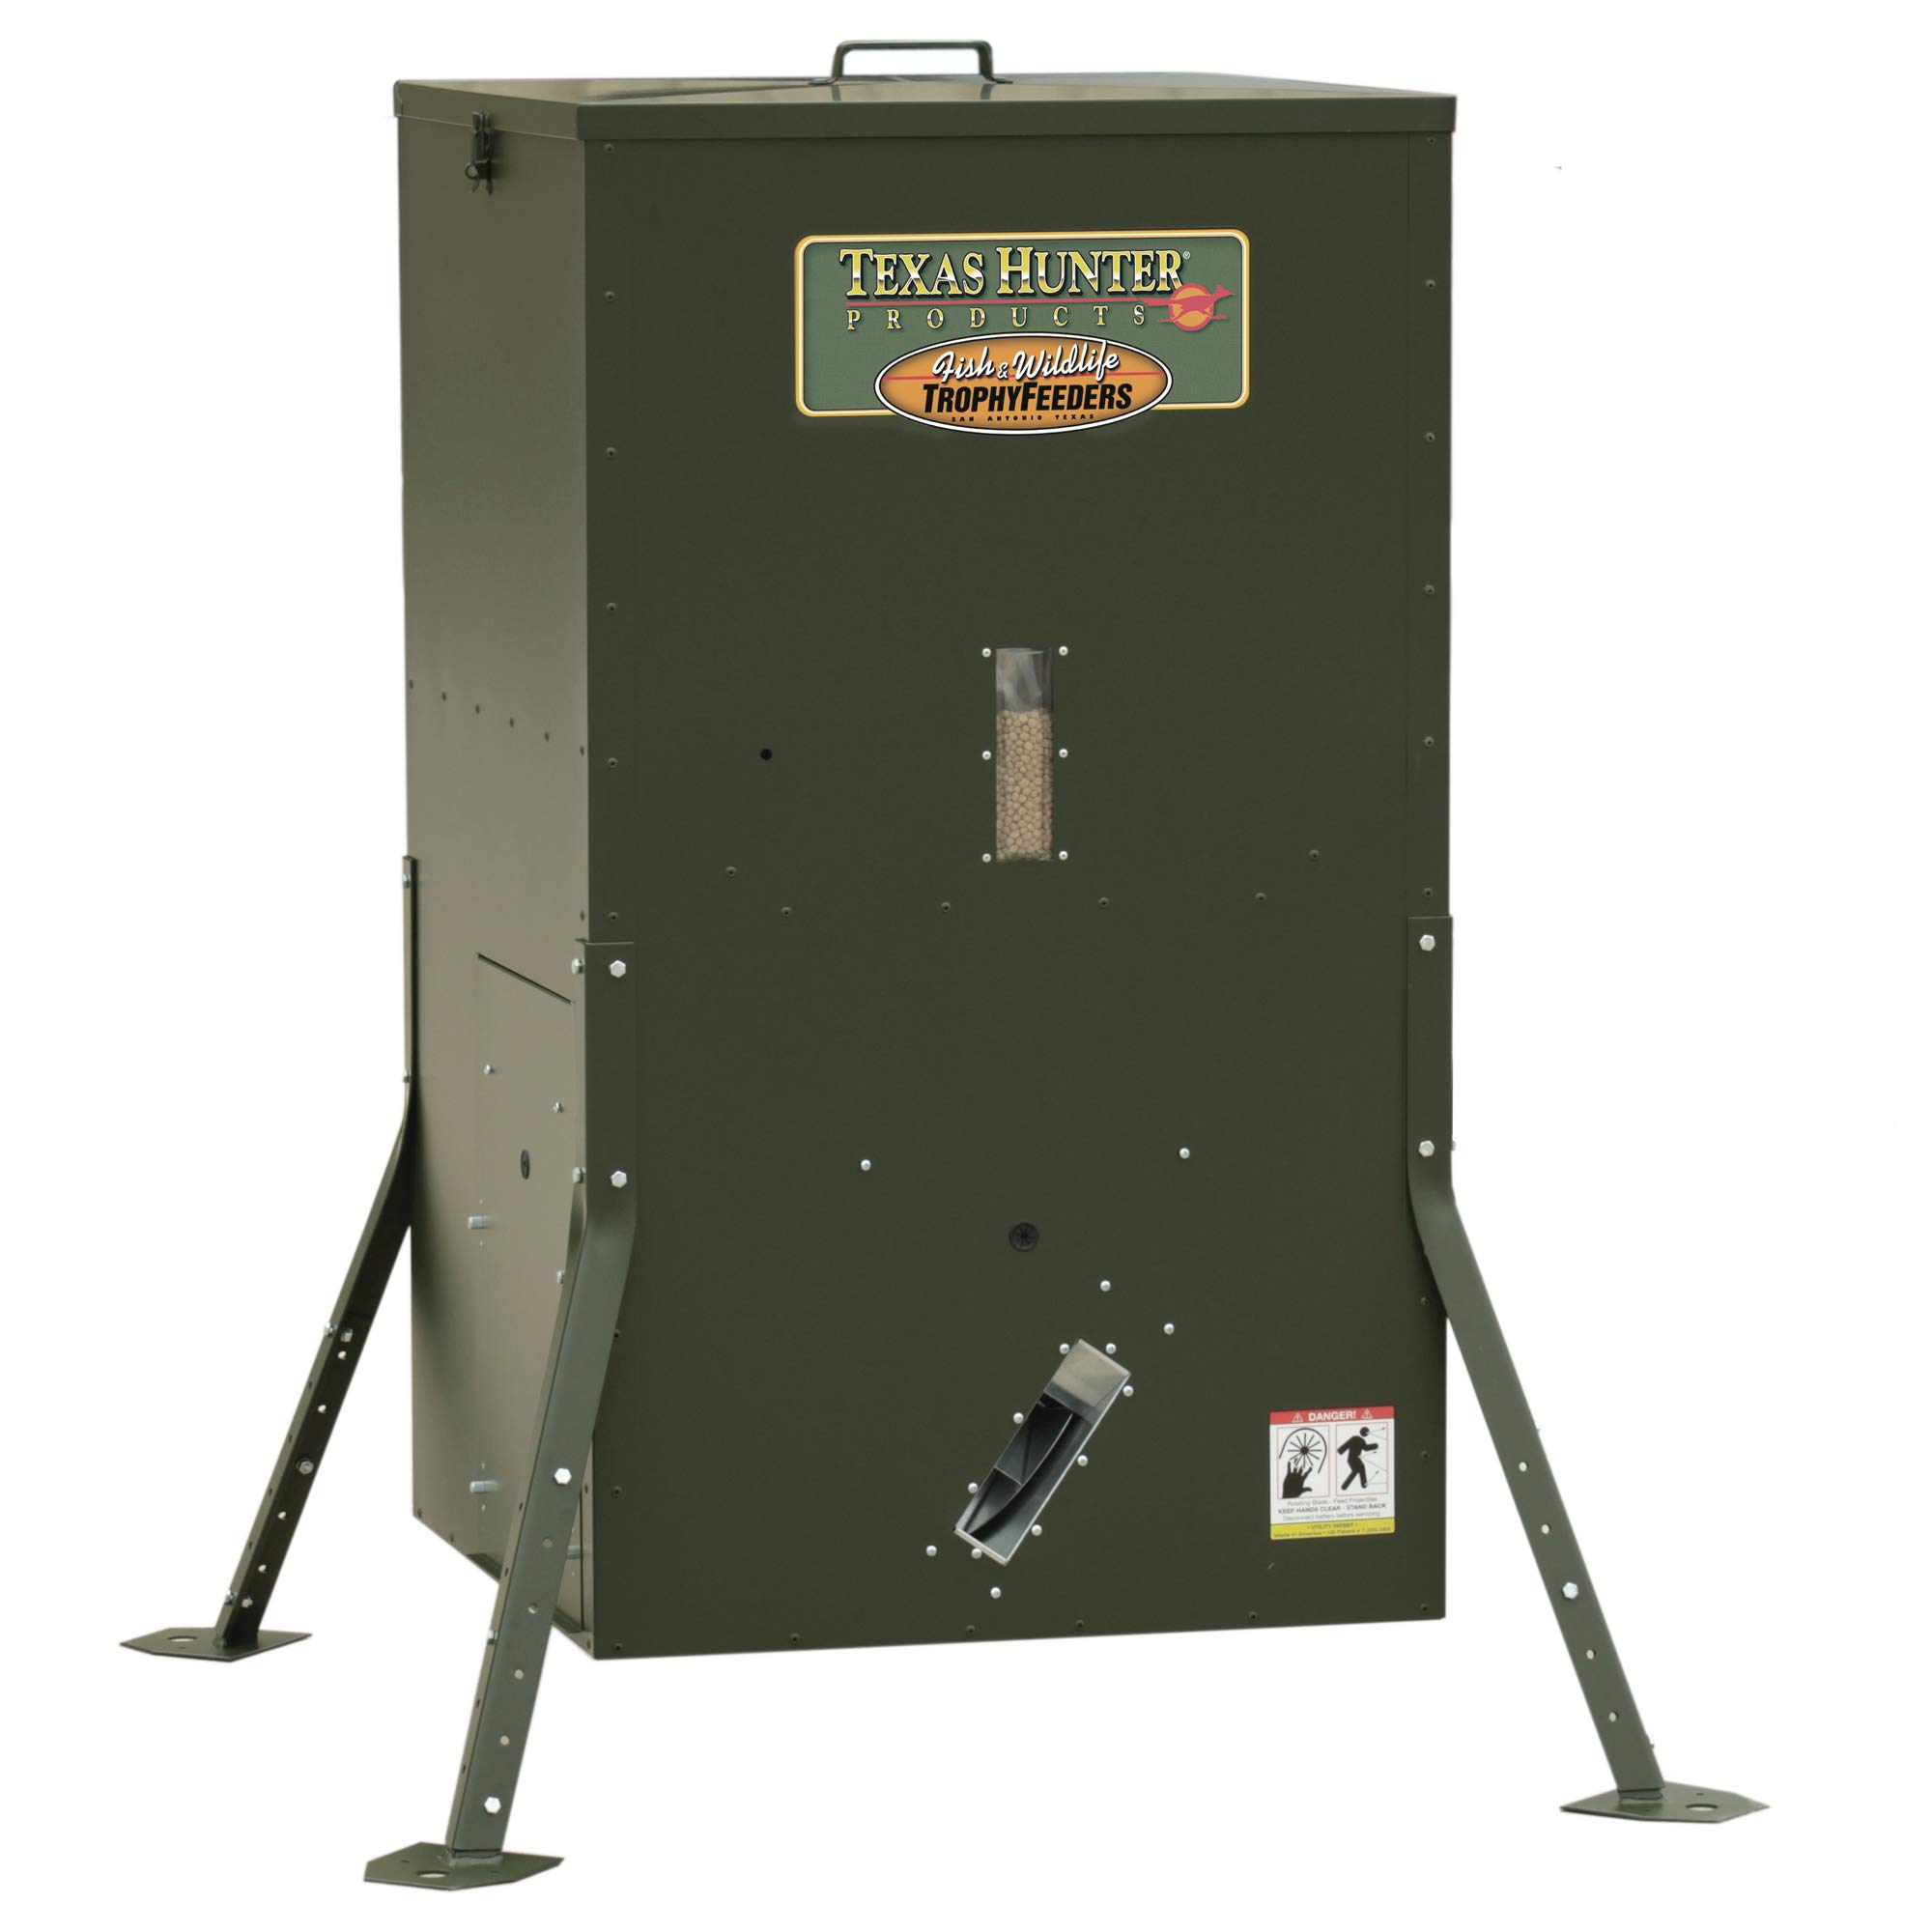 Texas Hunter Directional Fish Feeder w/Adjustable Legs - 250 lb. Fish Feed Capacity - Model DF425AL